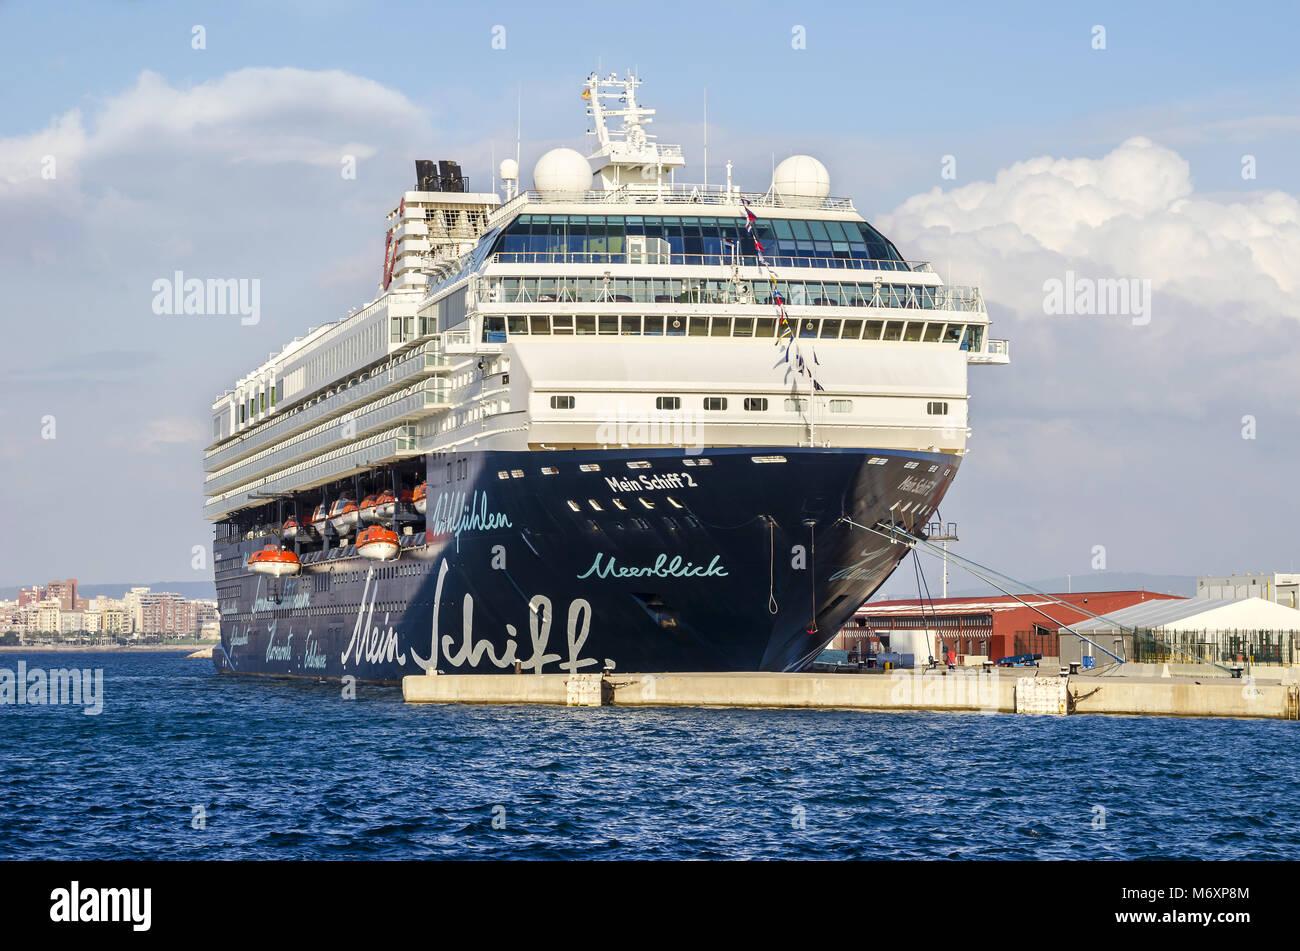 Palma de Mallorca, Spain - November 1, 2015:  Cruise liner Mein Schiff 2 of TUI Cruises anchored  in the harbour. - Stock Image